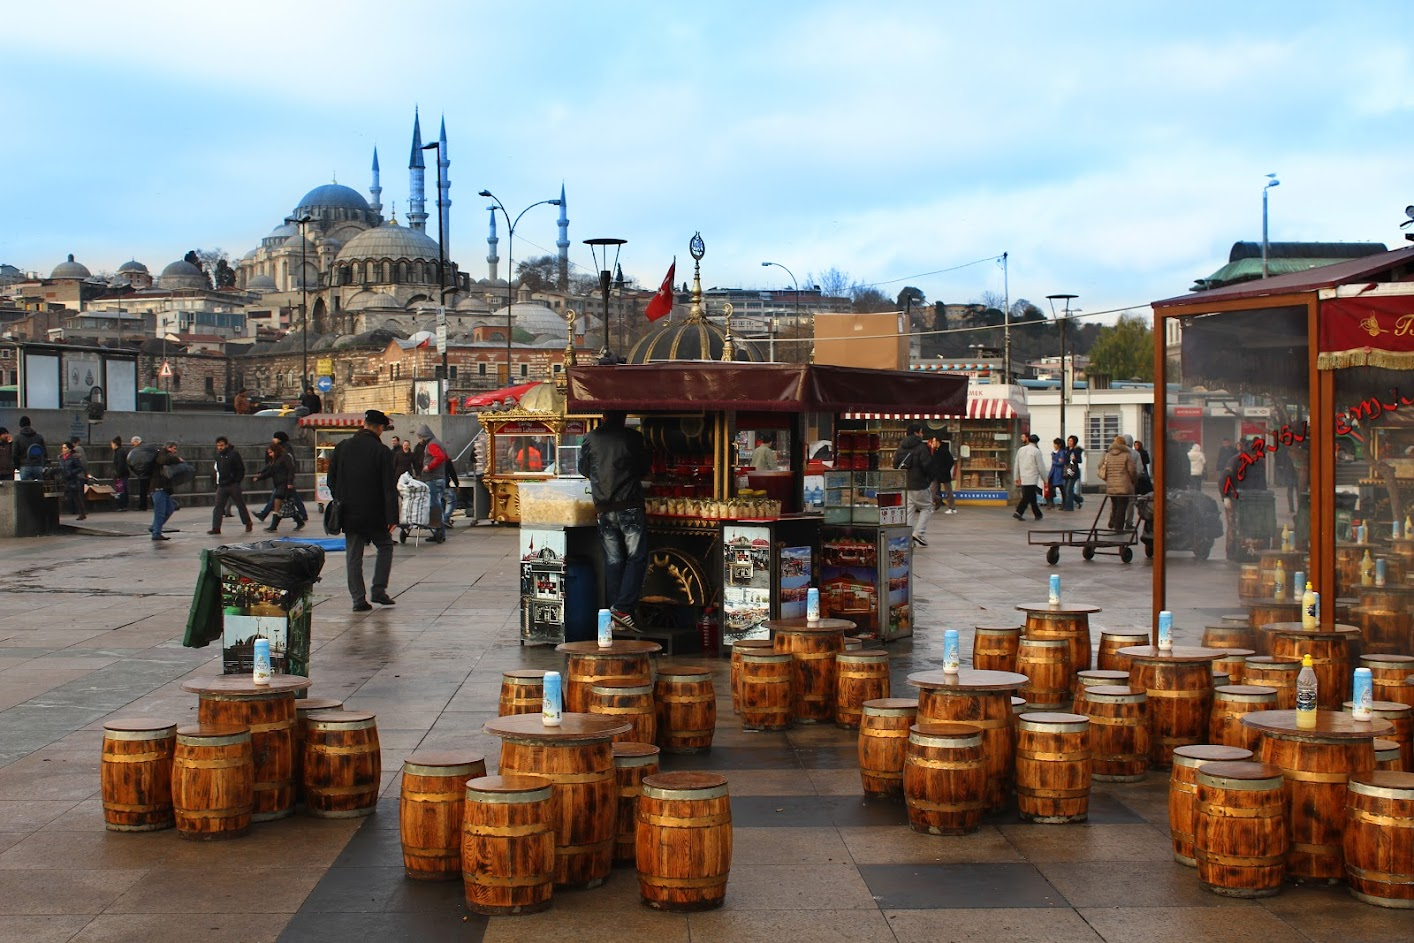 Roteiro ISTAMBUL - 3º dia em Istambul - Da Alta à Baixa | Turquia